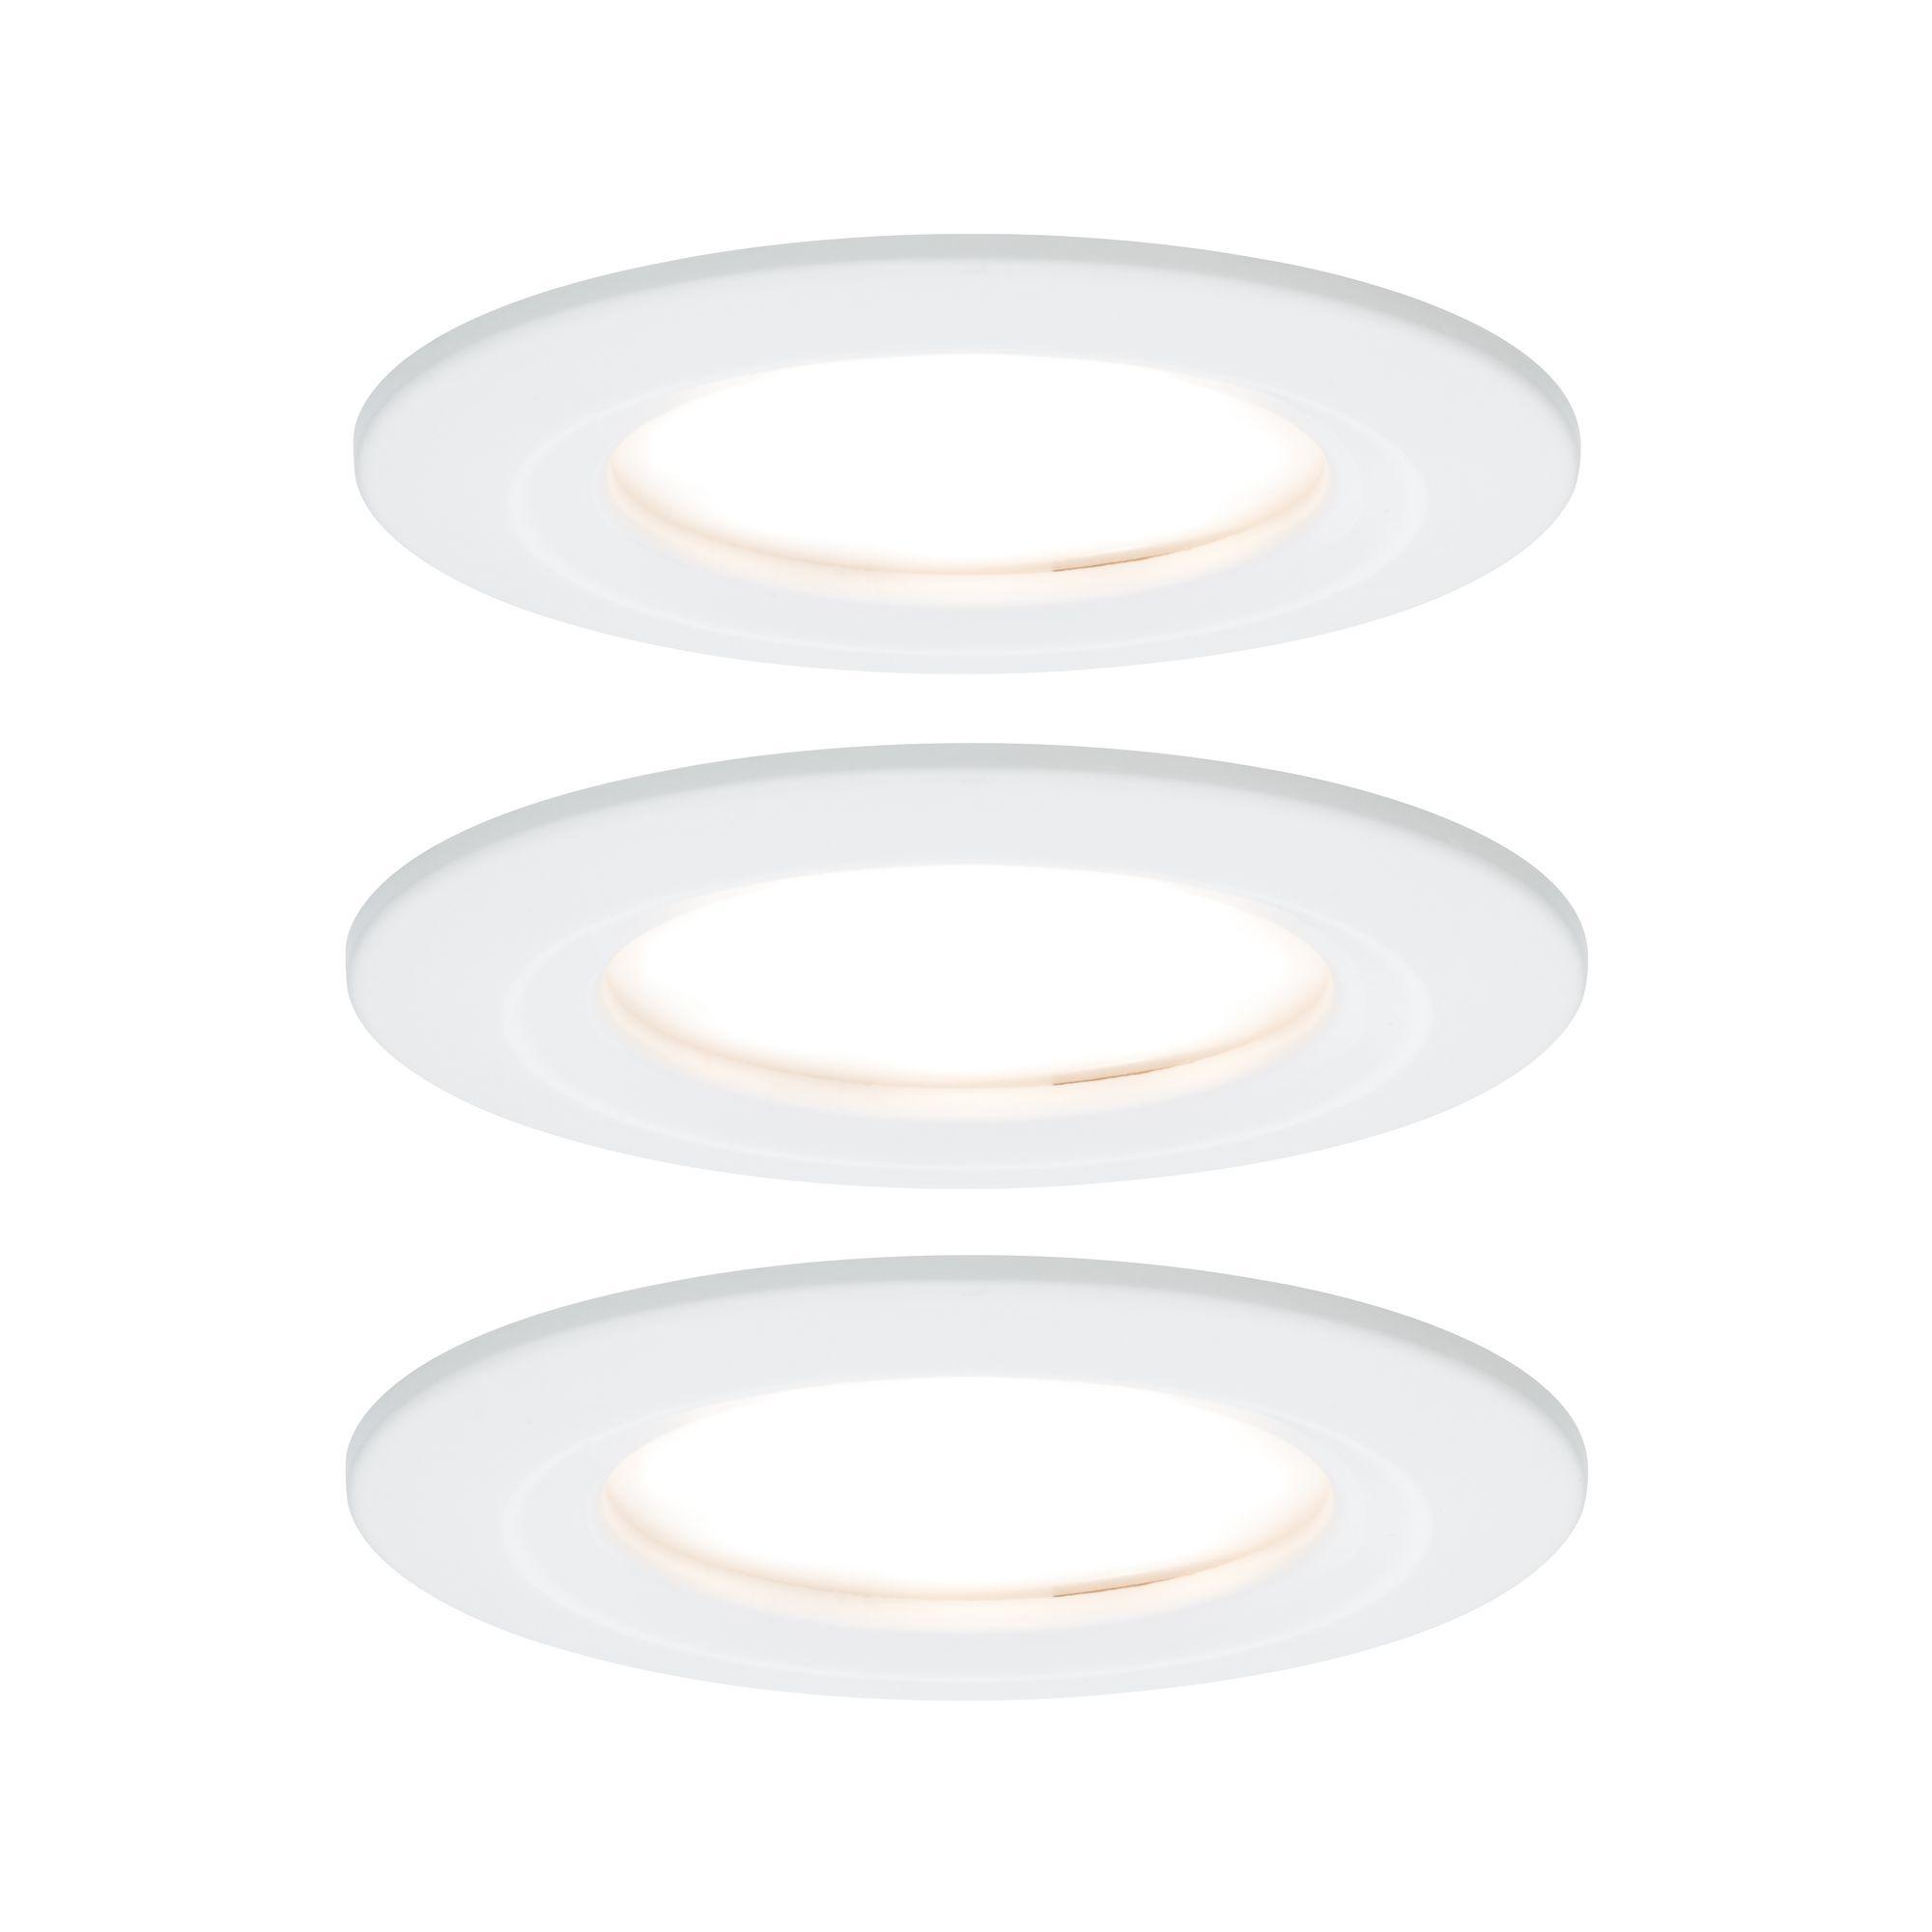 Paulmann EBL Set Nova Coin rund starr LED 3x6,5W2700K 230V Weiß matt/Alu